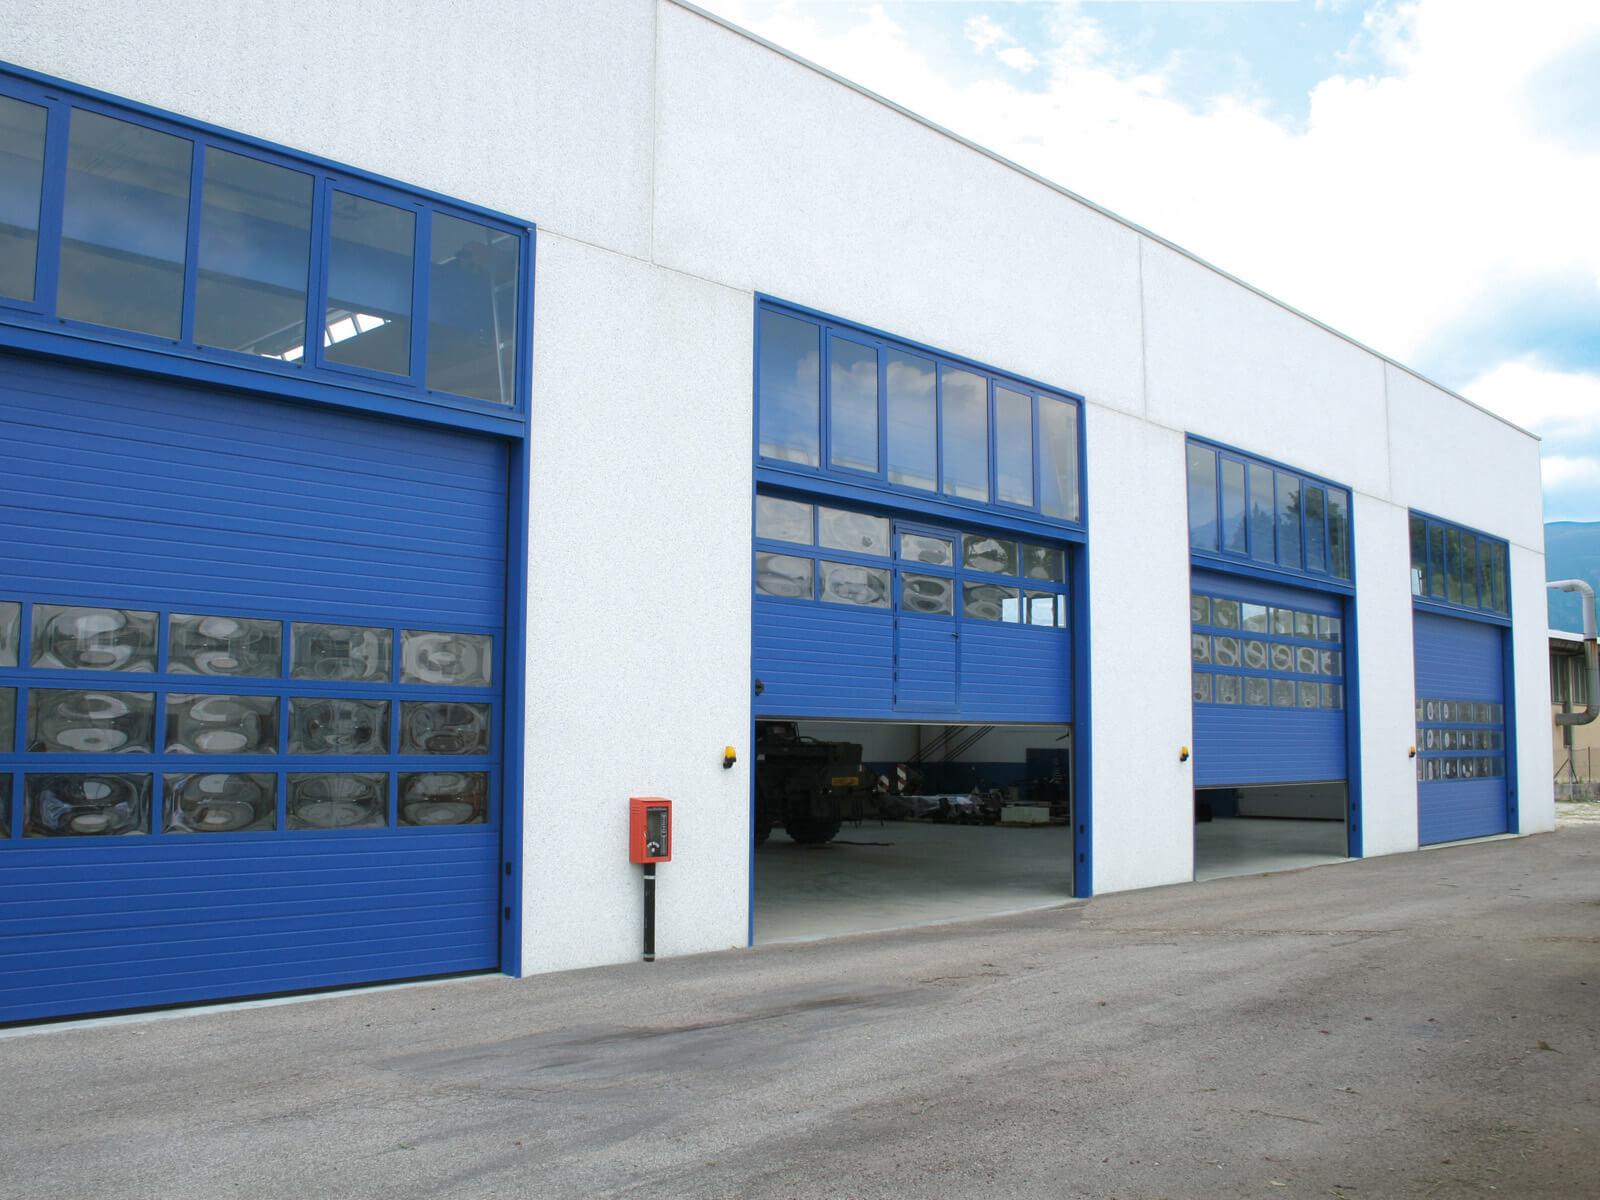 Portone sezionale industriale SECURA - Stucco blu RAL 5010 Visa